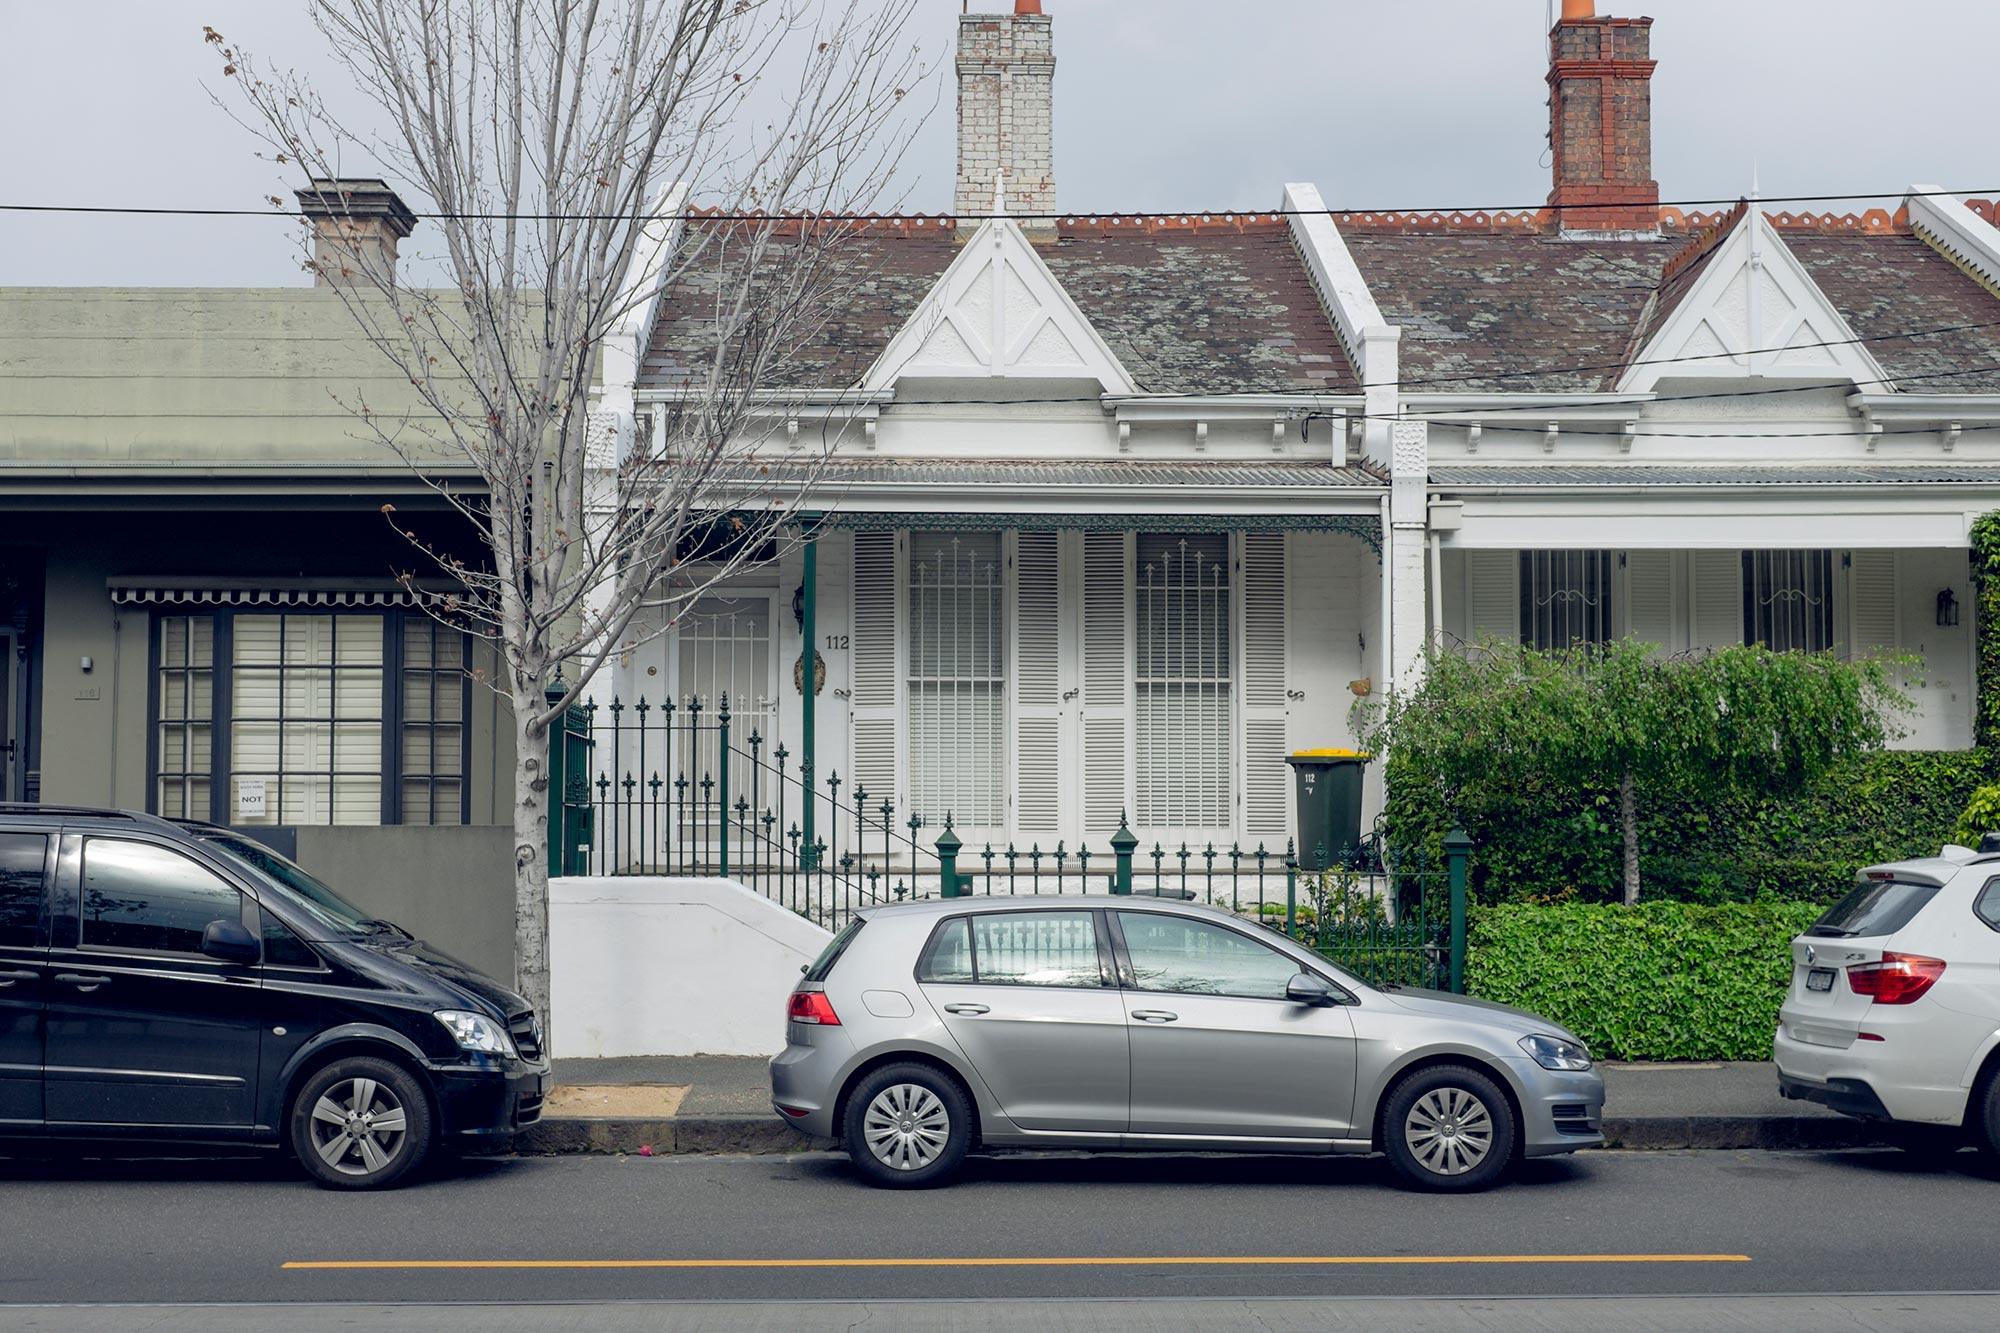 australia-melbourne-south-yarra-park-street1